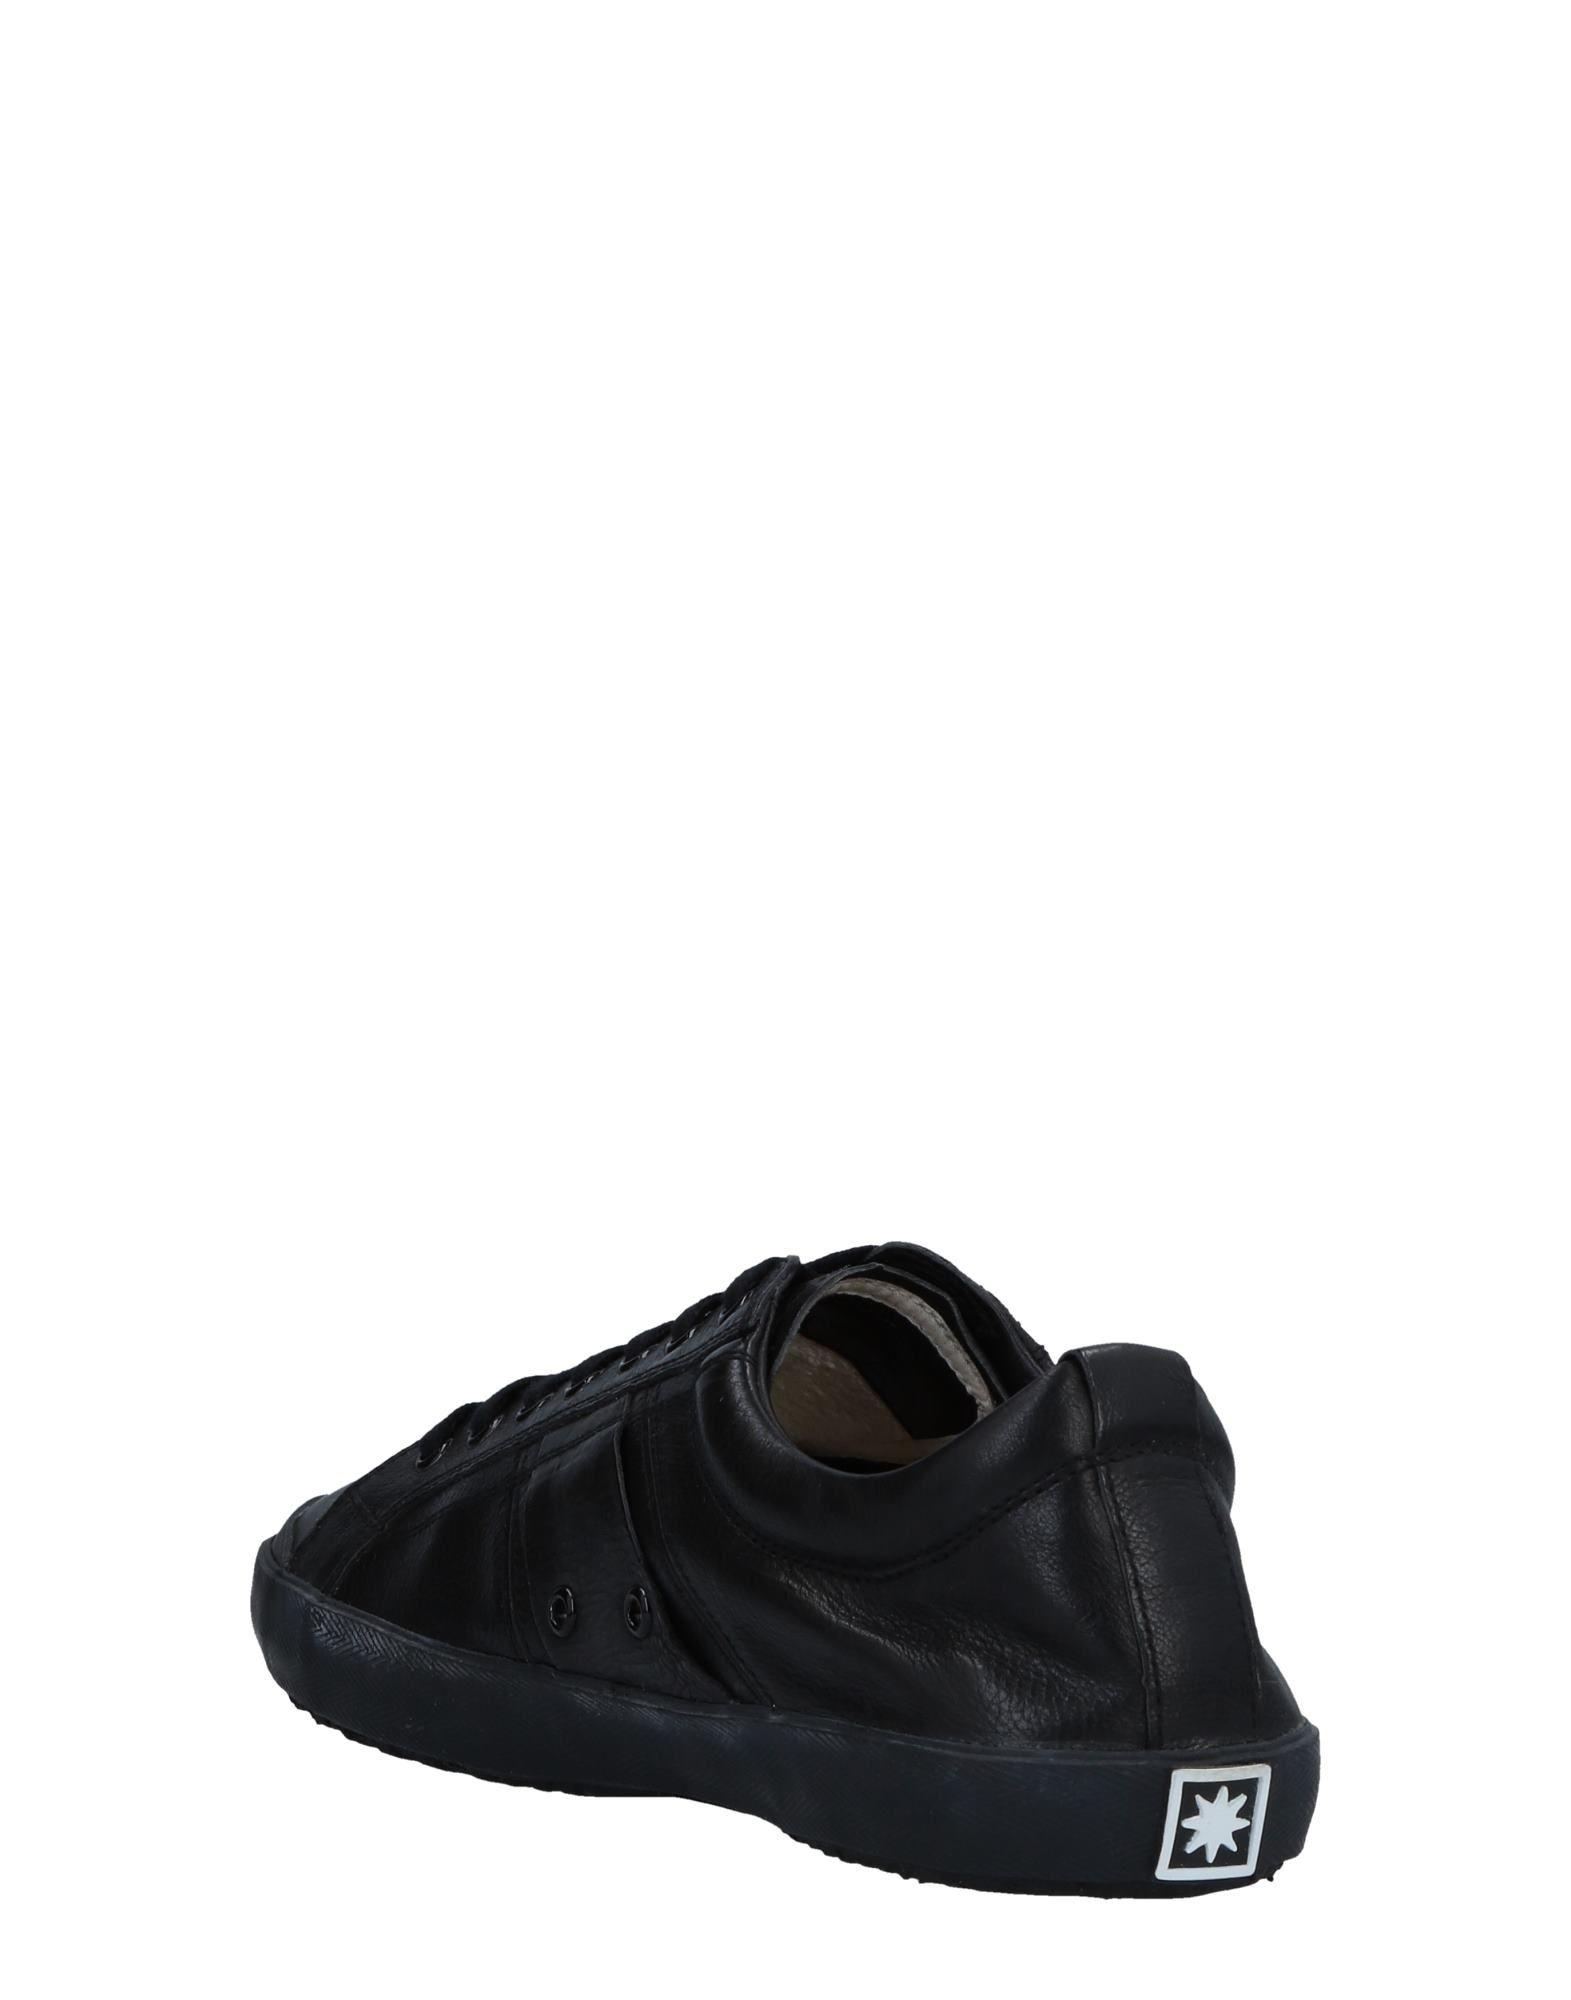 N.D.C. Herren Made By Hand Sneakers Herren N.D.C.  11515812VP Heiße Schuhe 2b0d25